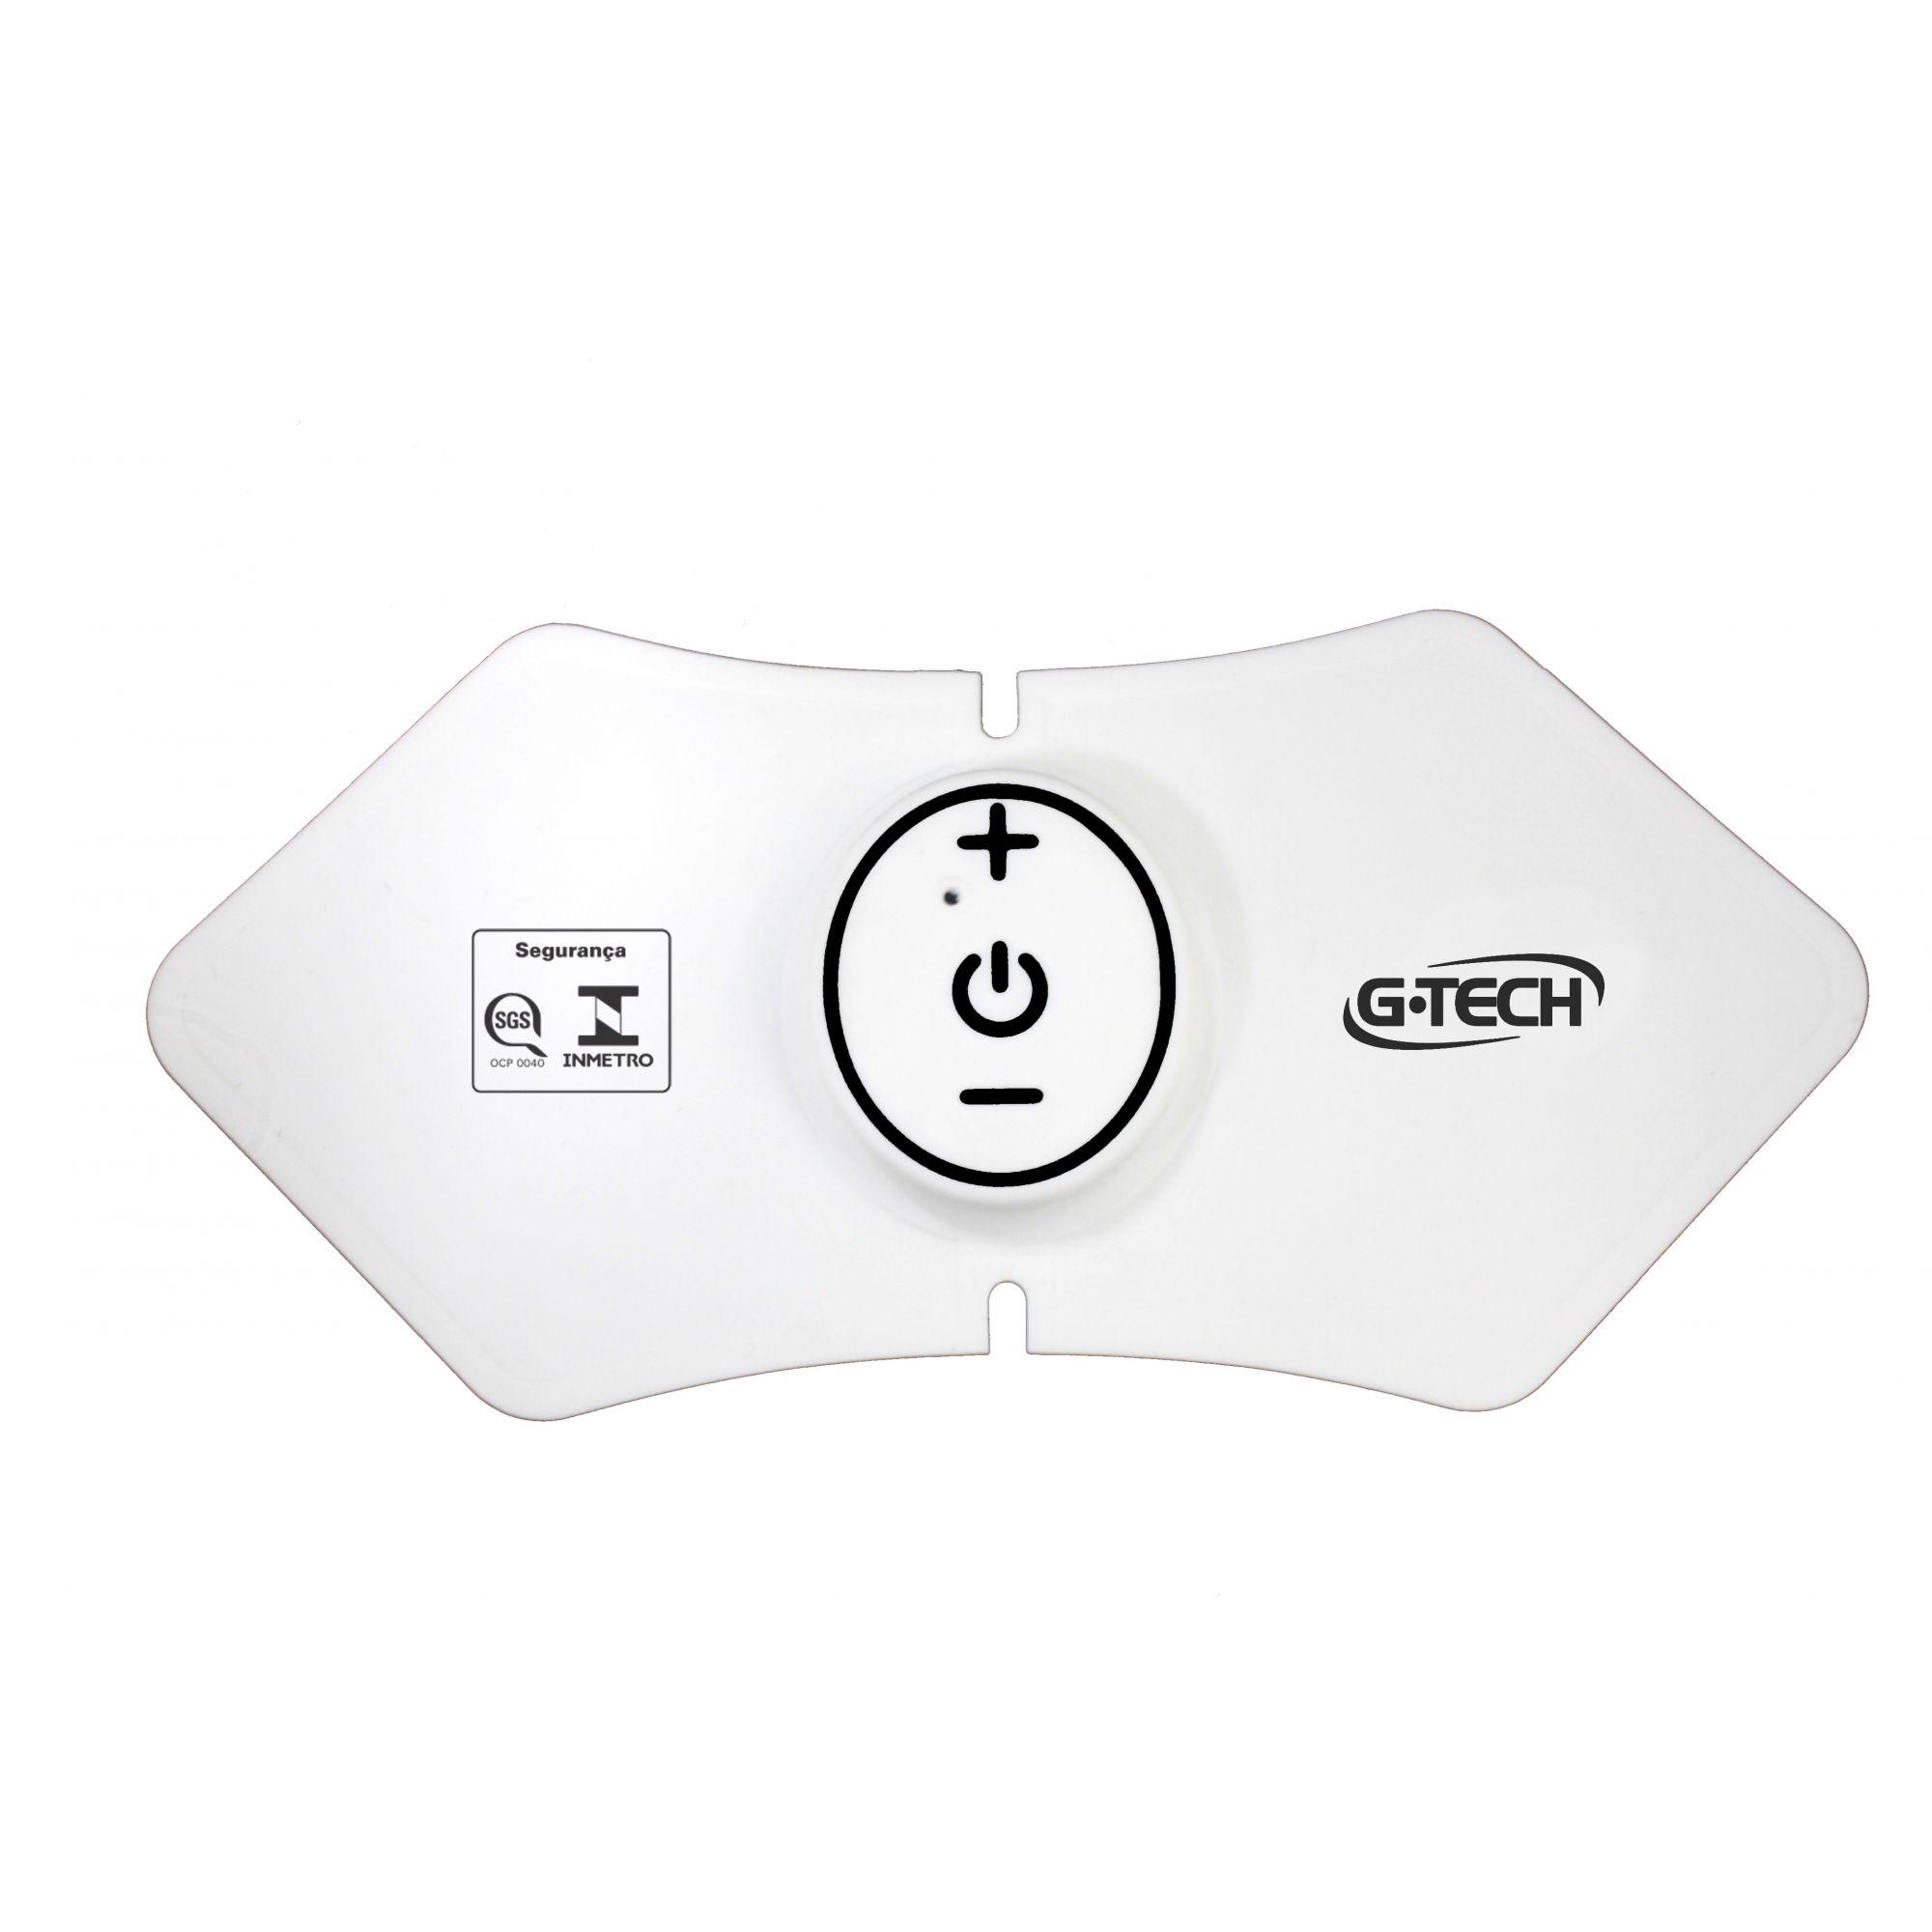 Eletroestimulador TENS G-Tech Alívio Já - Accumed